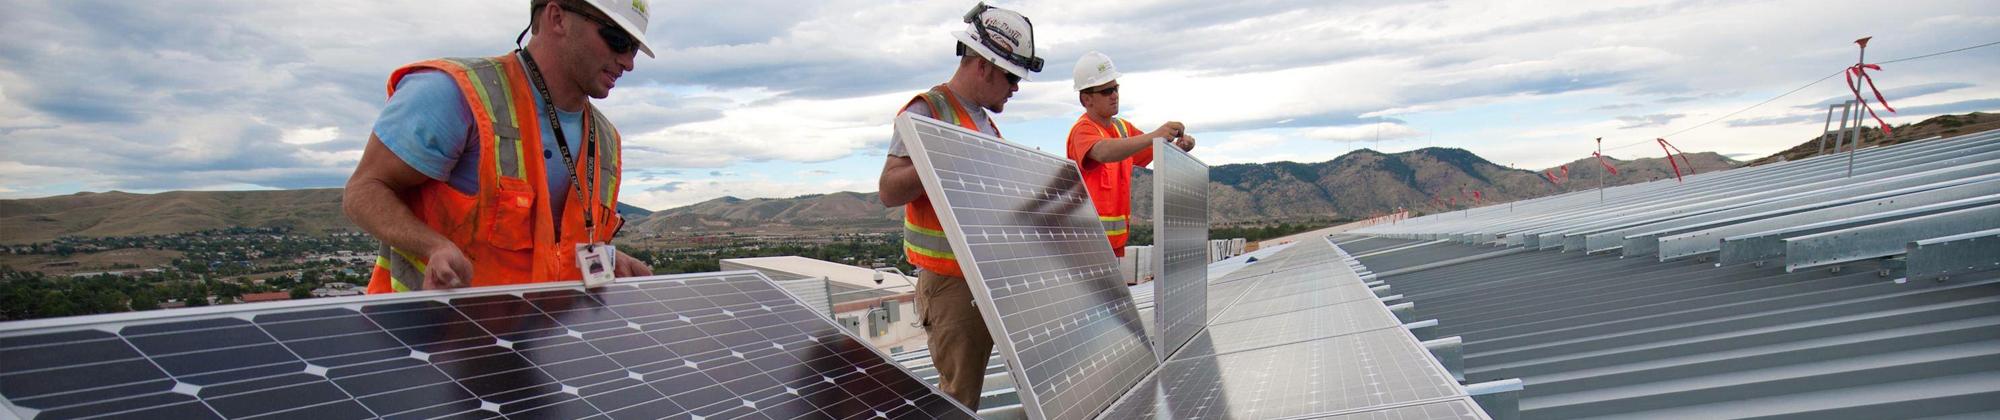 pasini-impianti-fotovoltaici-a-imola